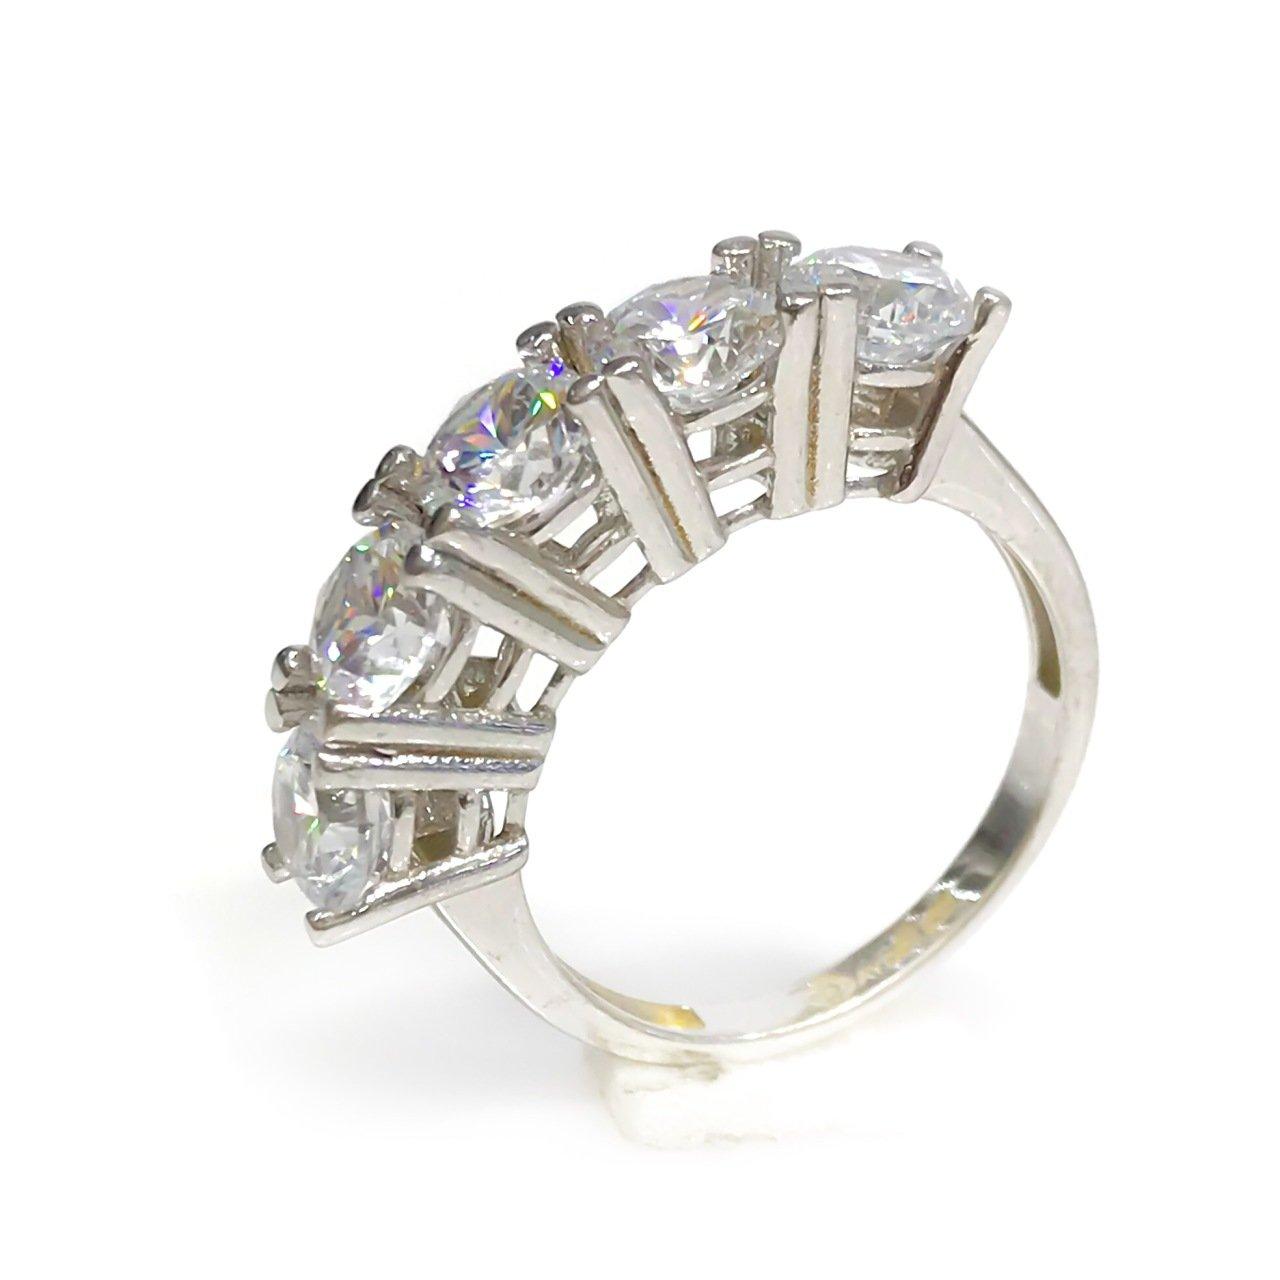 5 Dibs Diamond Montür Showy White Gold Wedding Band Ring